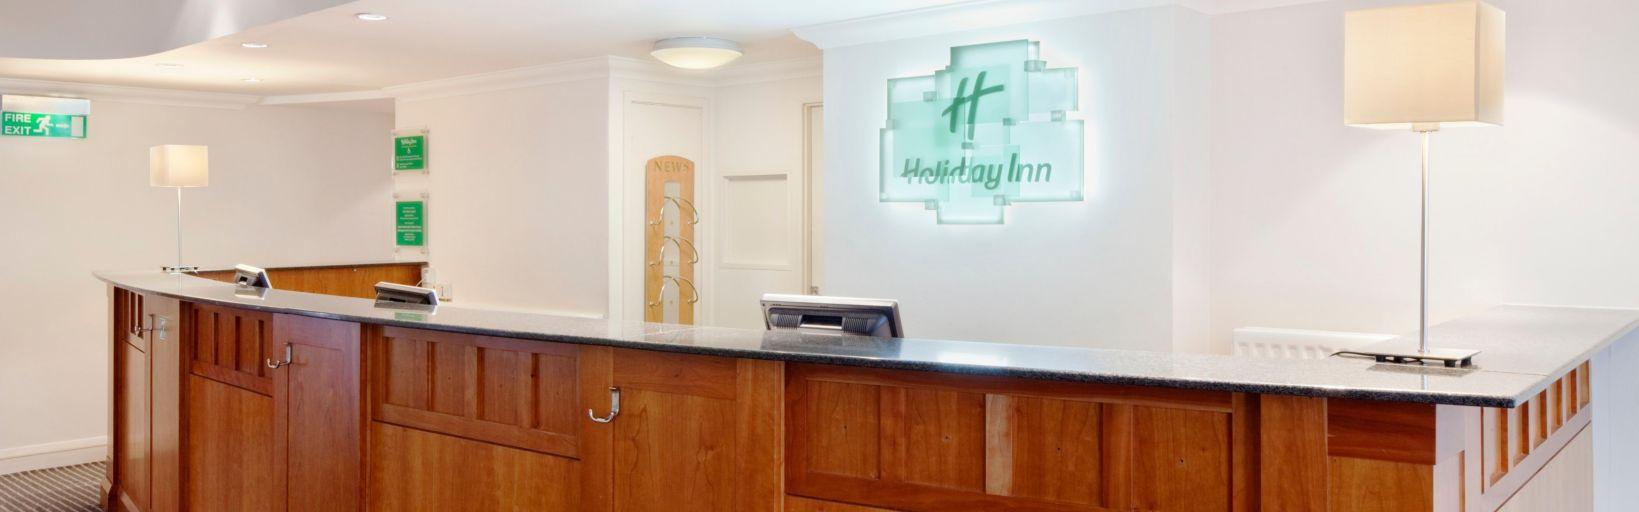 Holiday Inn Basildon Hotel by IHG